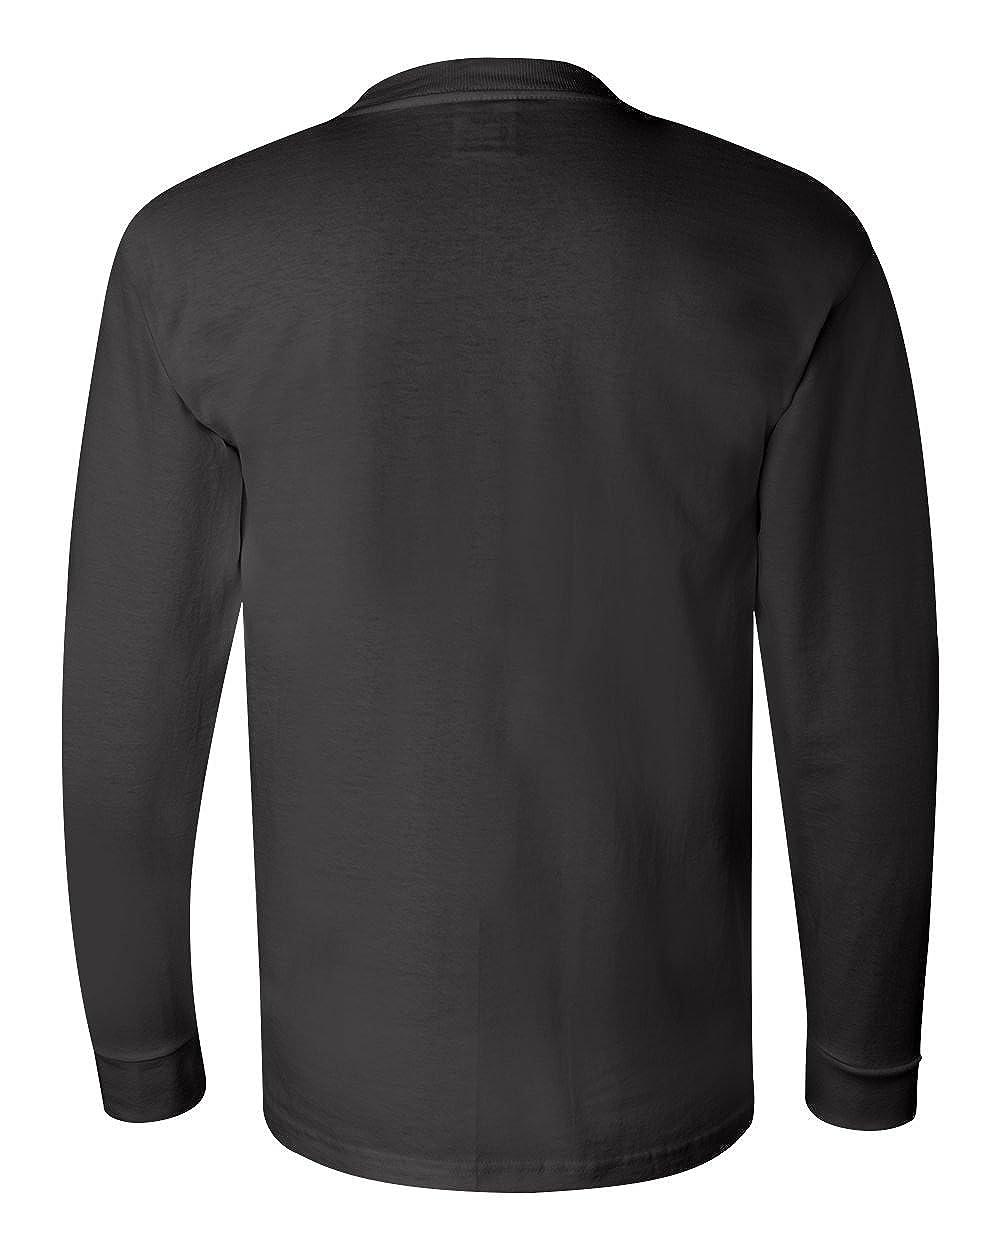 Bayside BA6100 Basic T-Shirt